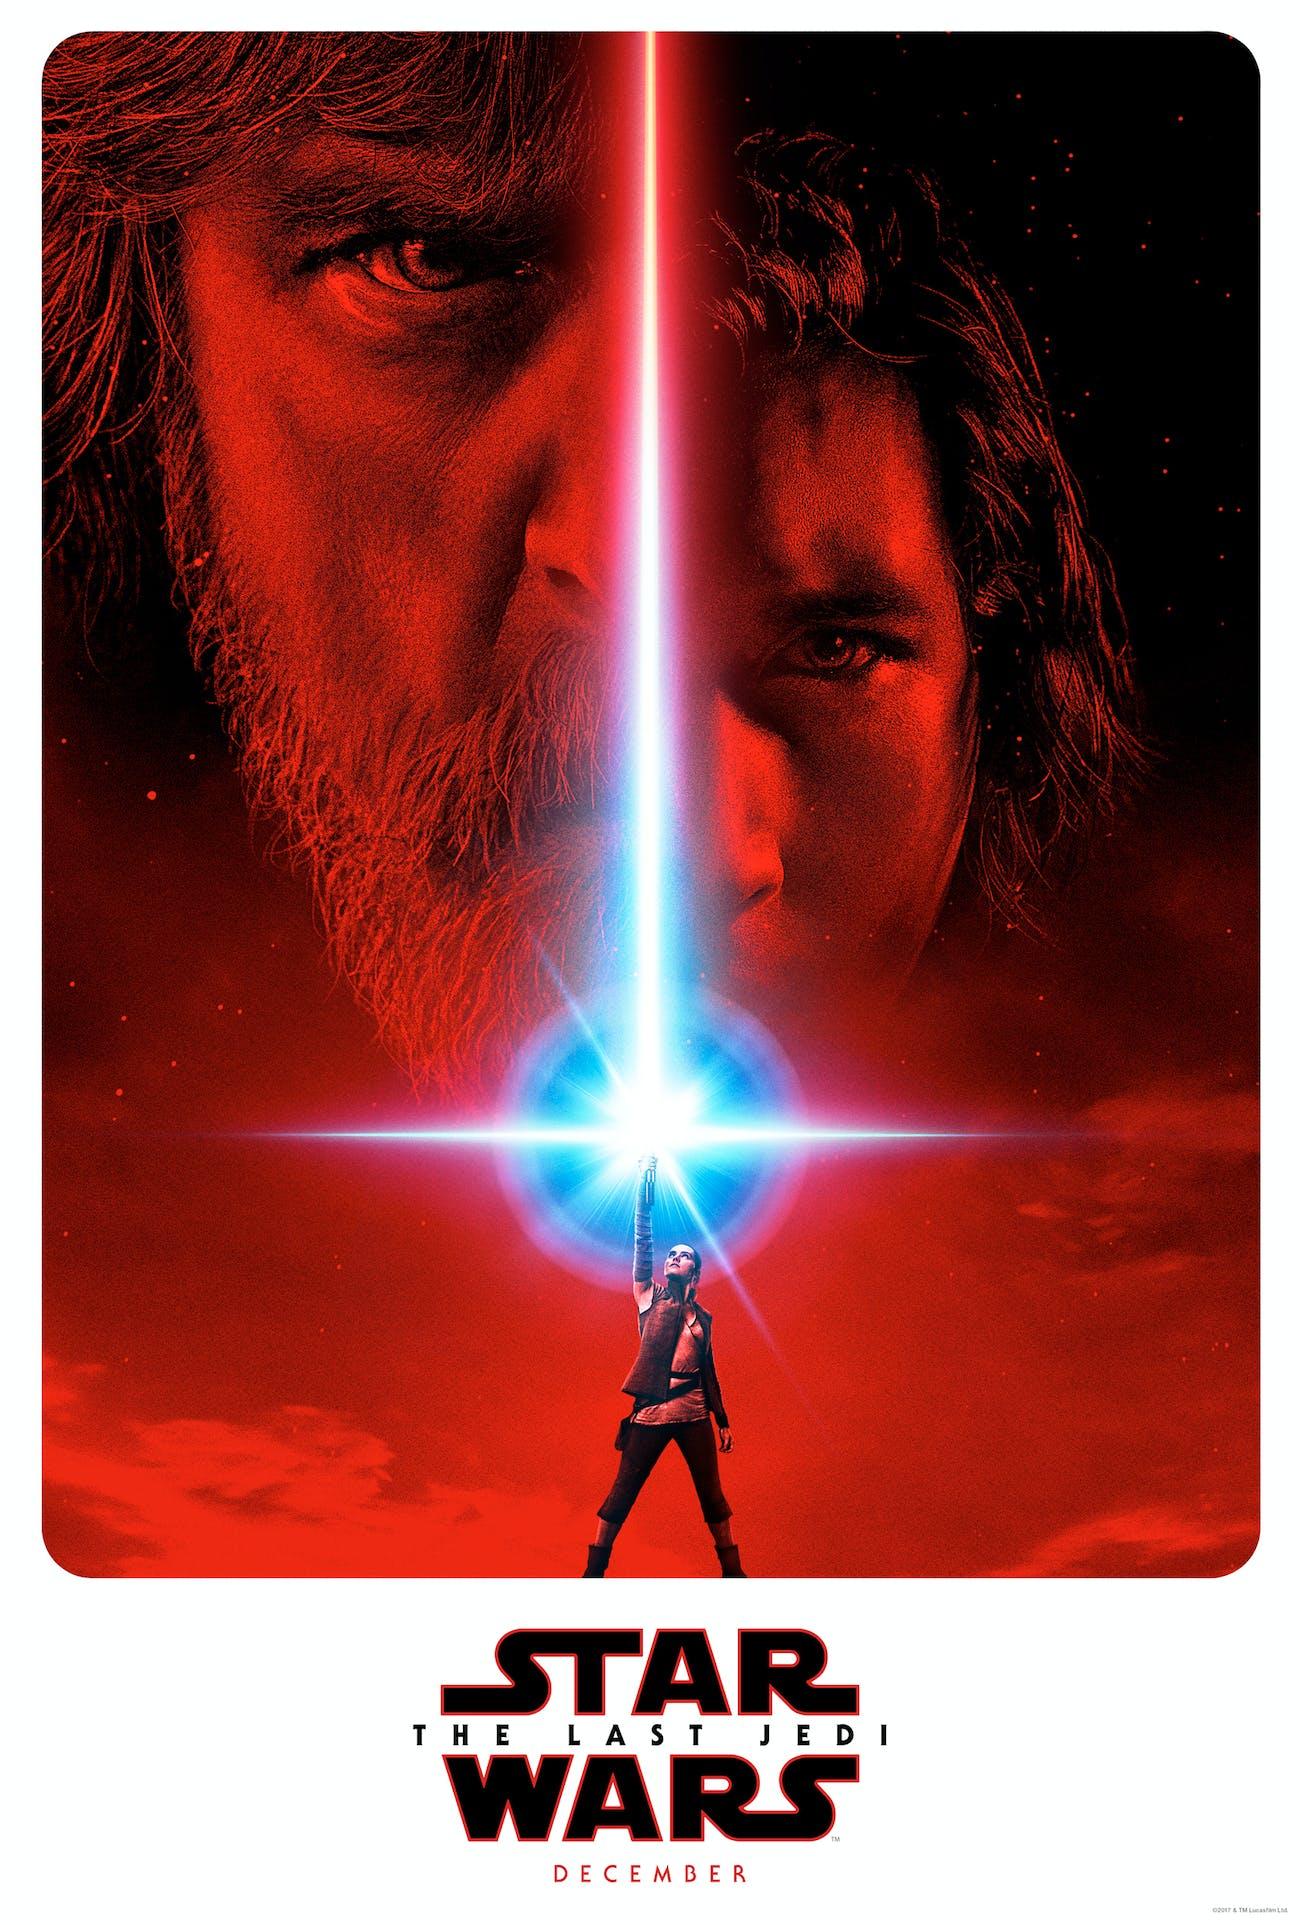 Teaser poster for 'Star Wars: The Last Jedi'.